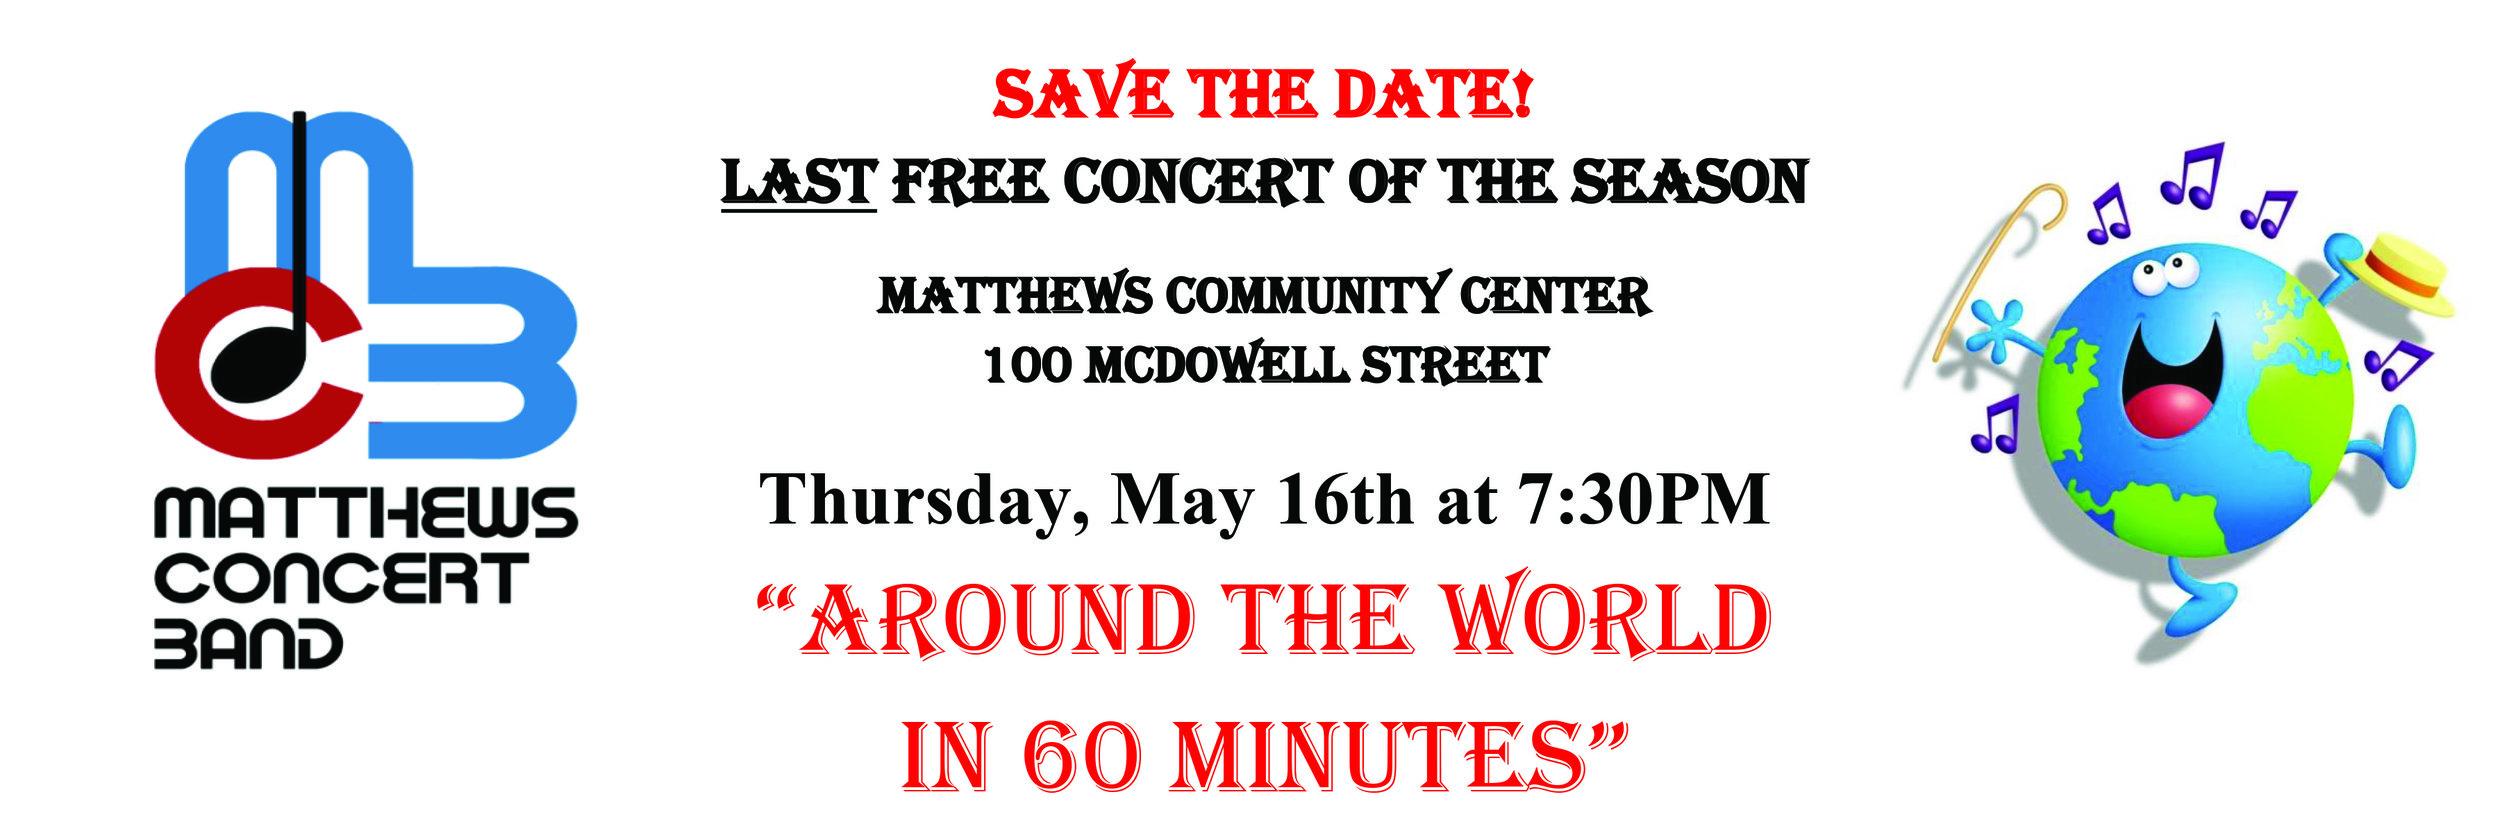 MCB May Concert 2019 Flyer.jpg